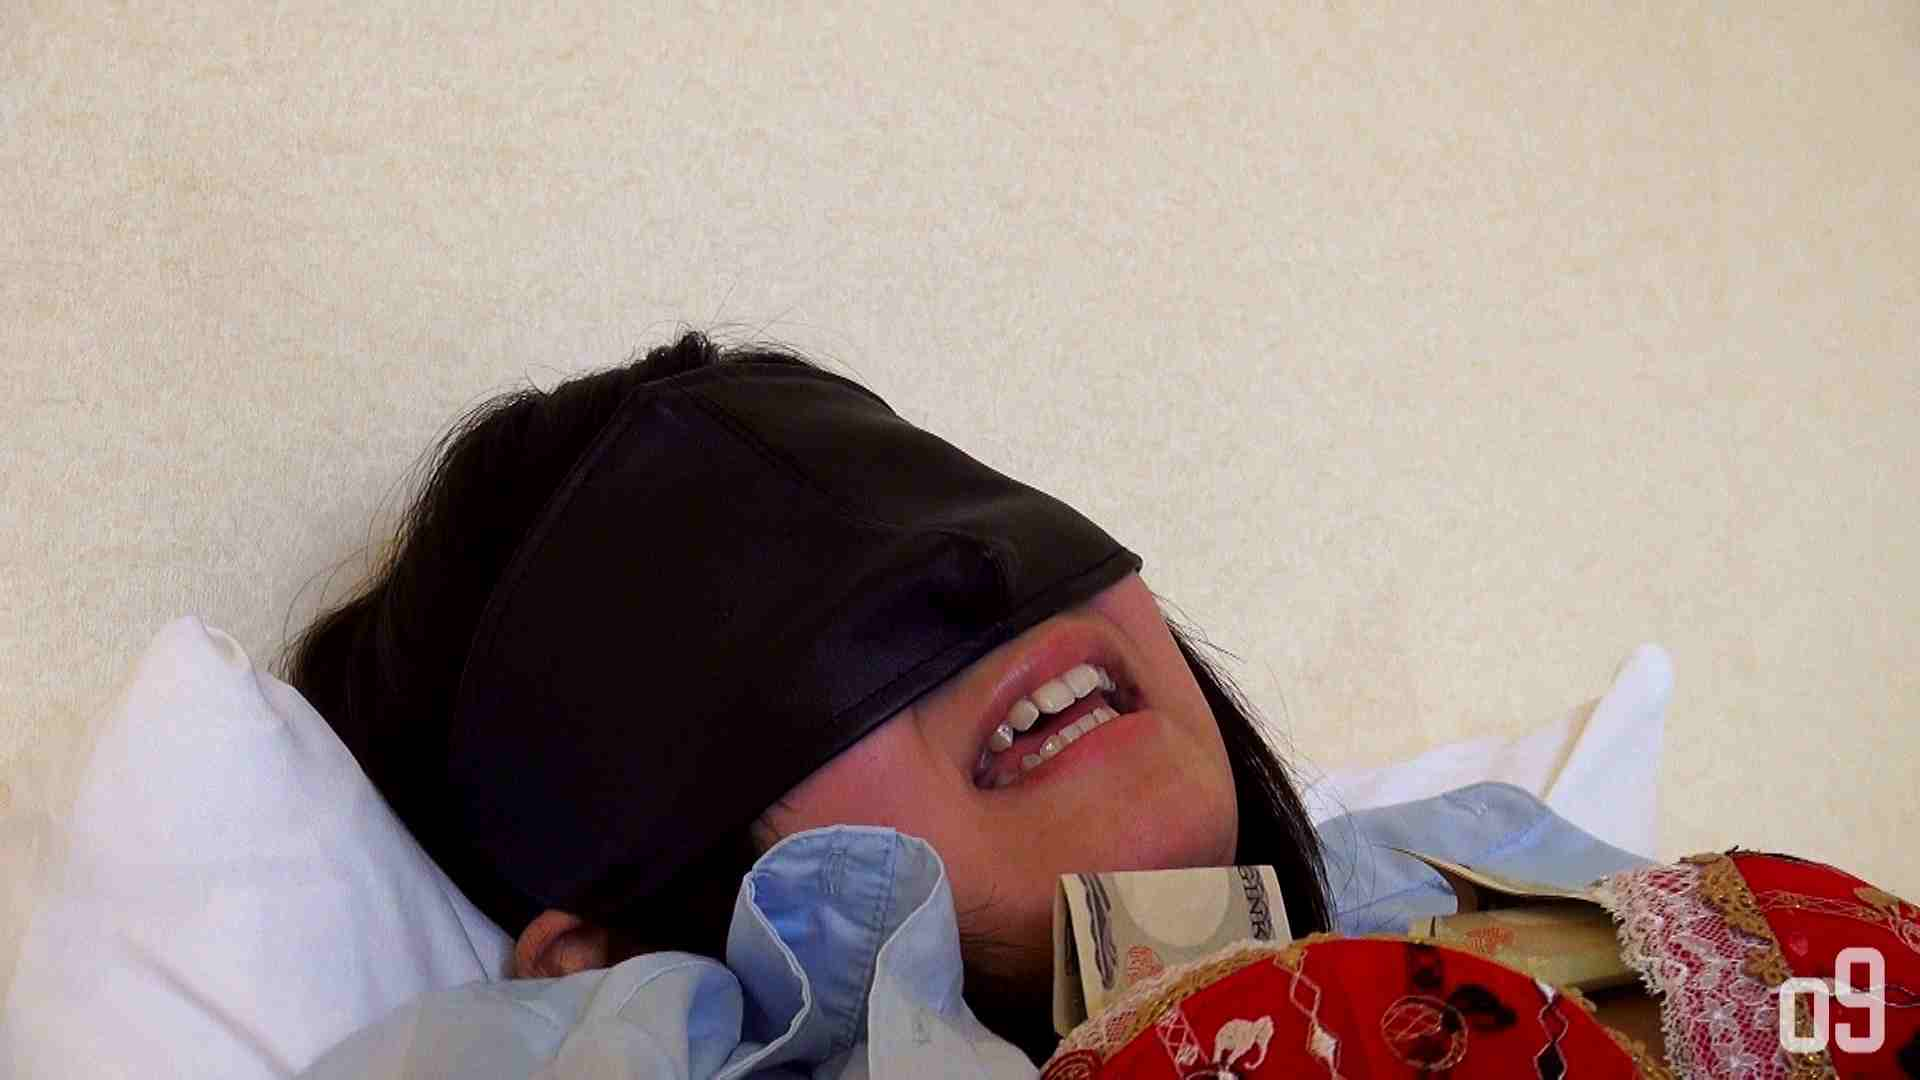 vol.6 TKSさんが震える!留華ちゃんの不慣れな手コキで念願の射精! 顔出しNG一般女性 | エッチなOL  99pic 11